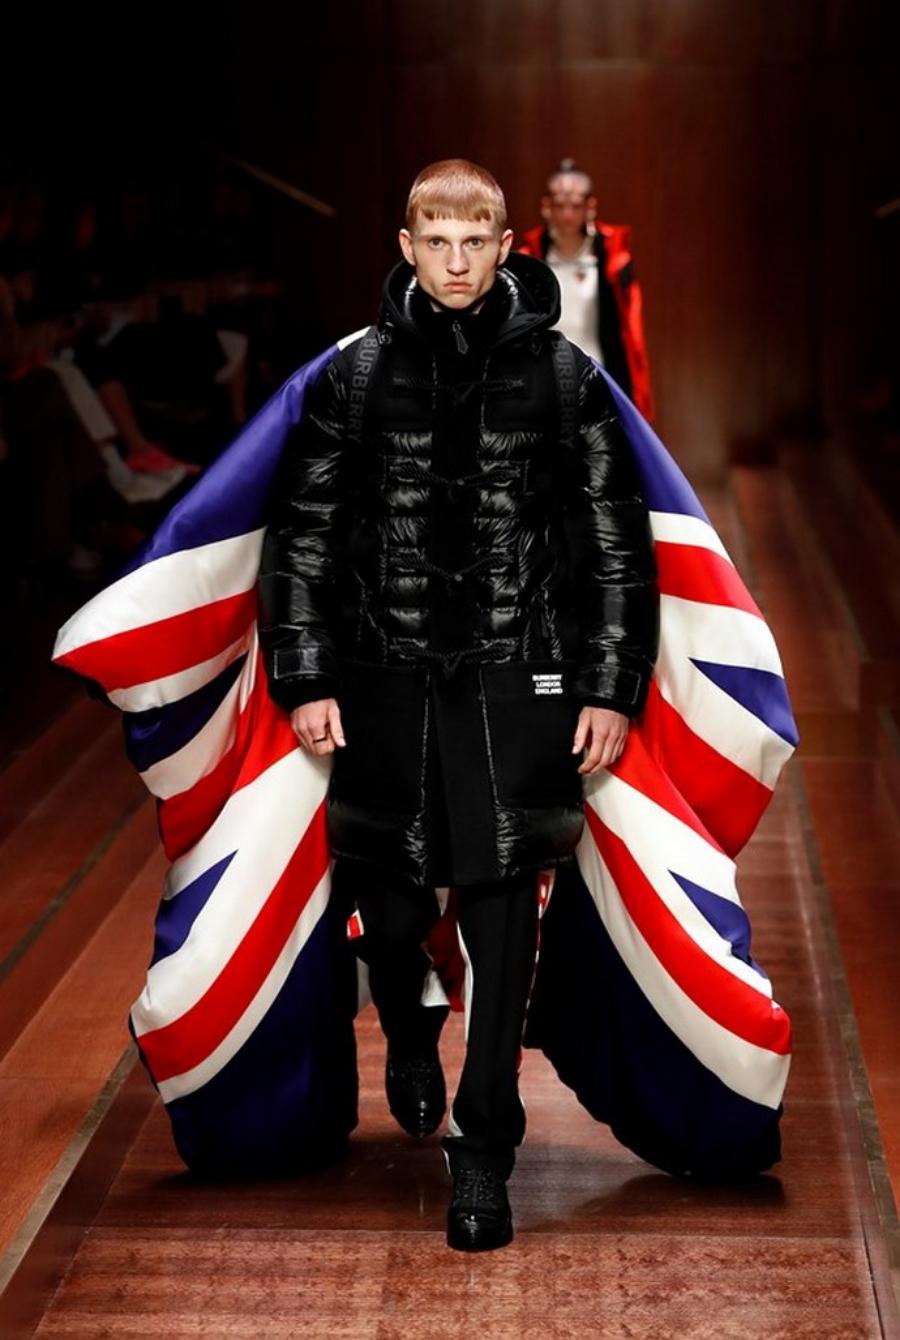 London Fashion Week 2019 – When Fashion Meets Interior Design london fashion week 2019 London Fashion Week 2019 – When Fashion Meets Interior Design 8 1